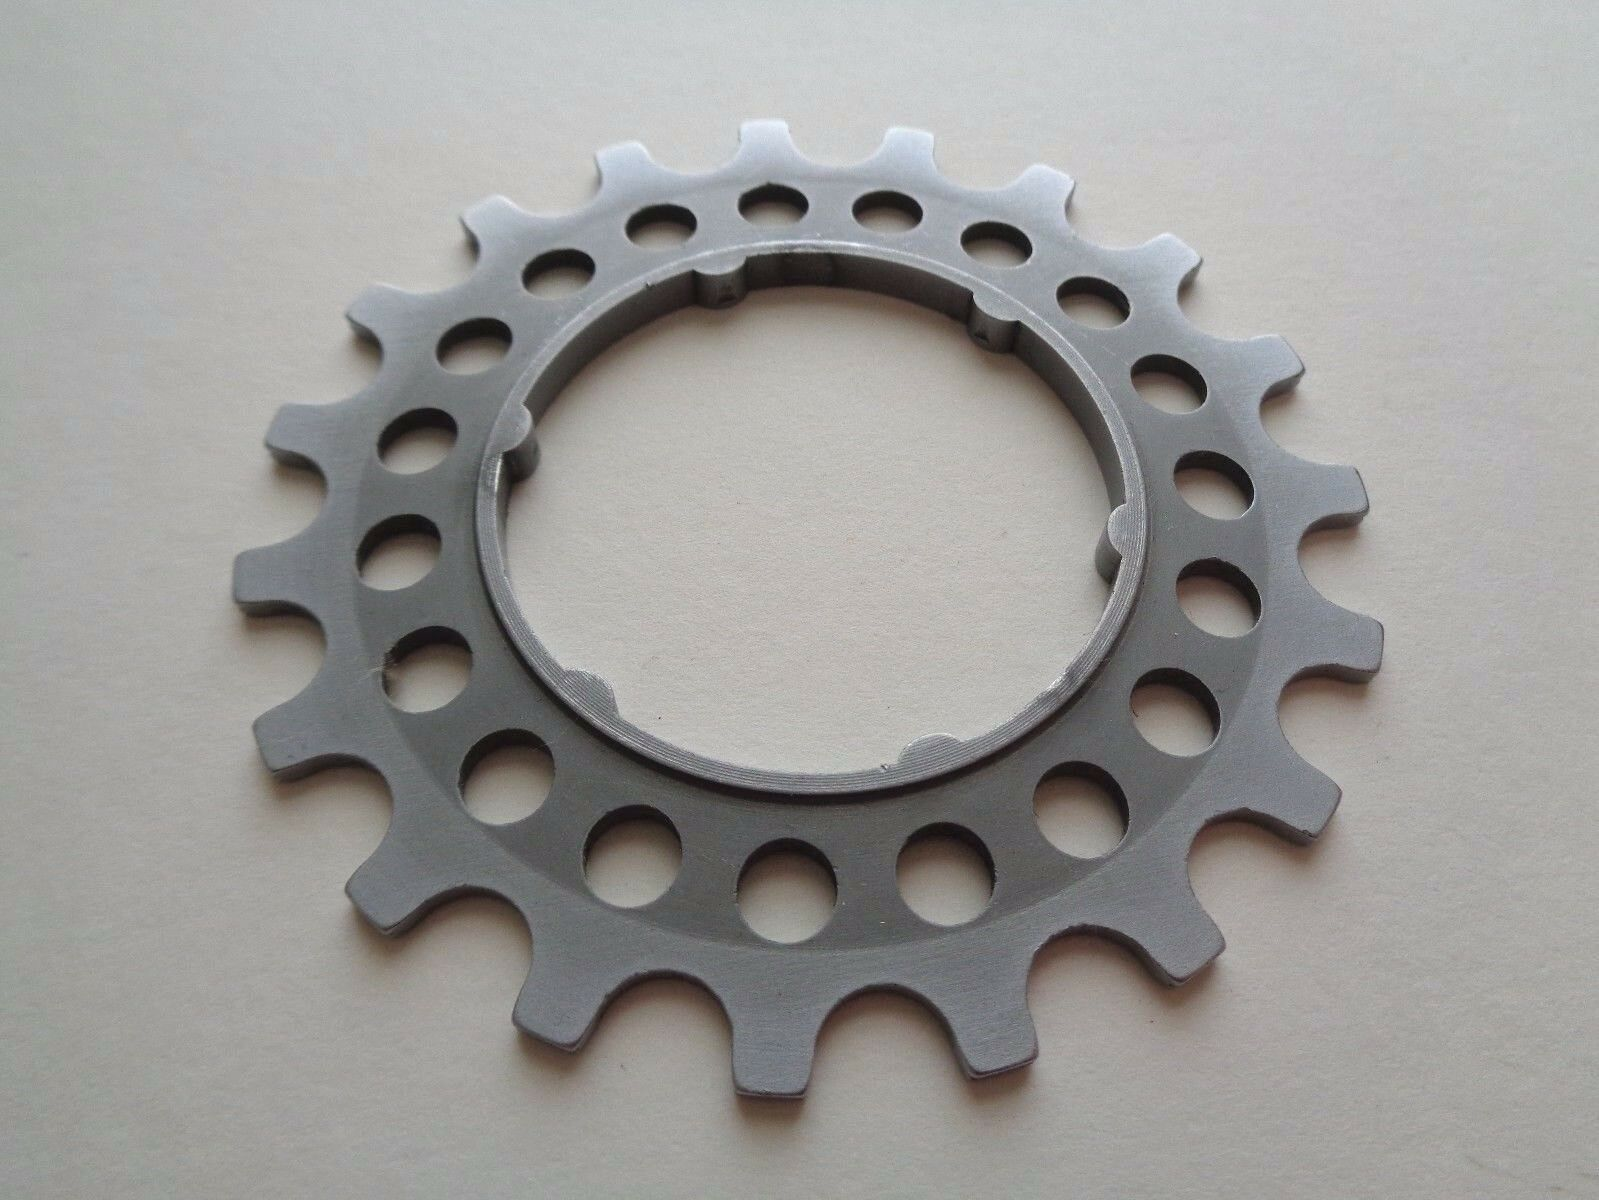 NOS Vintage 1980s Campagnolo DE19 Aluminium 19t Italian  freewheel cassette Cog  find your favorite here